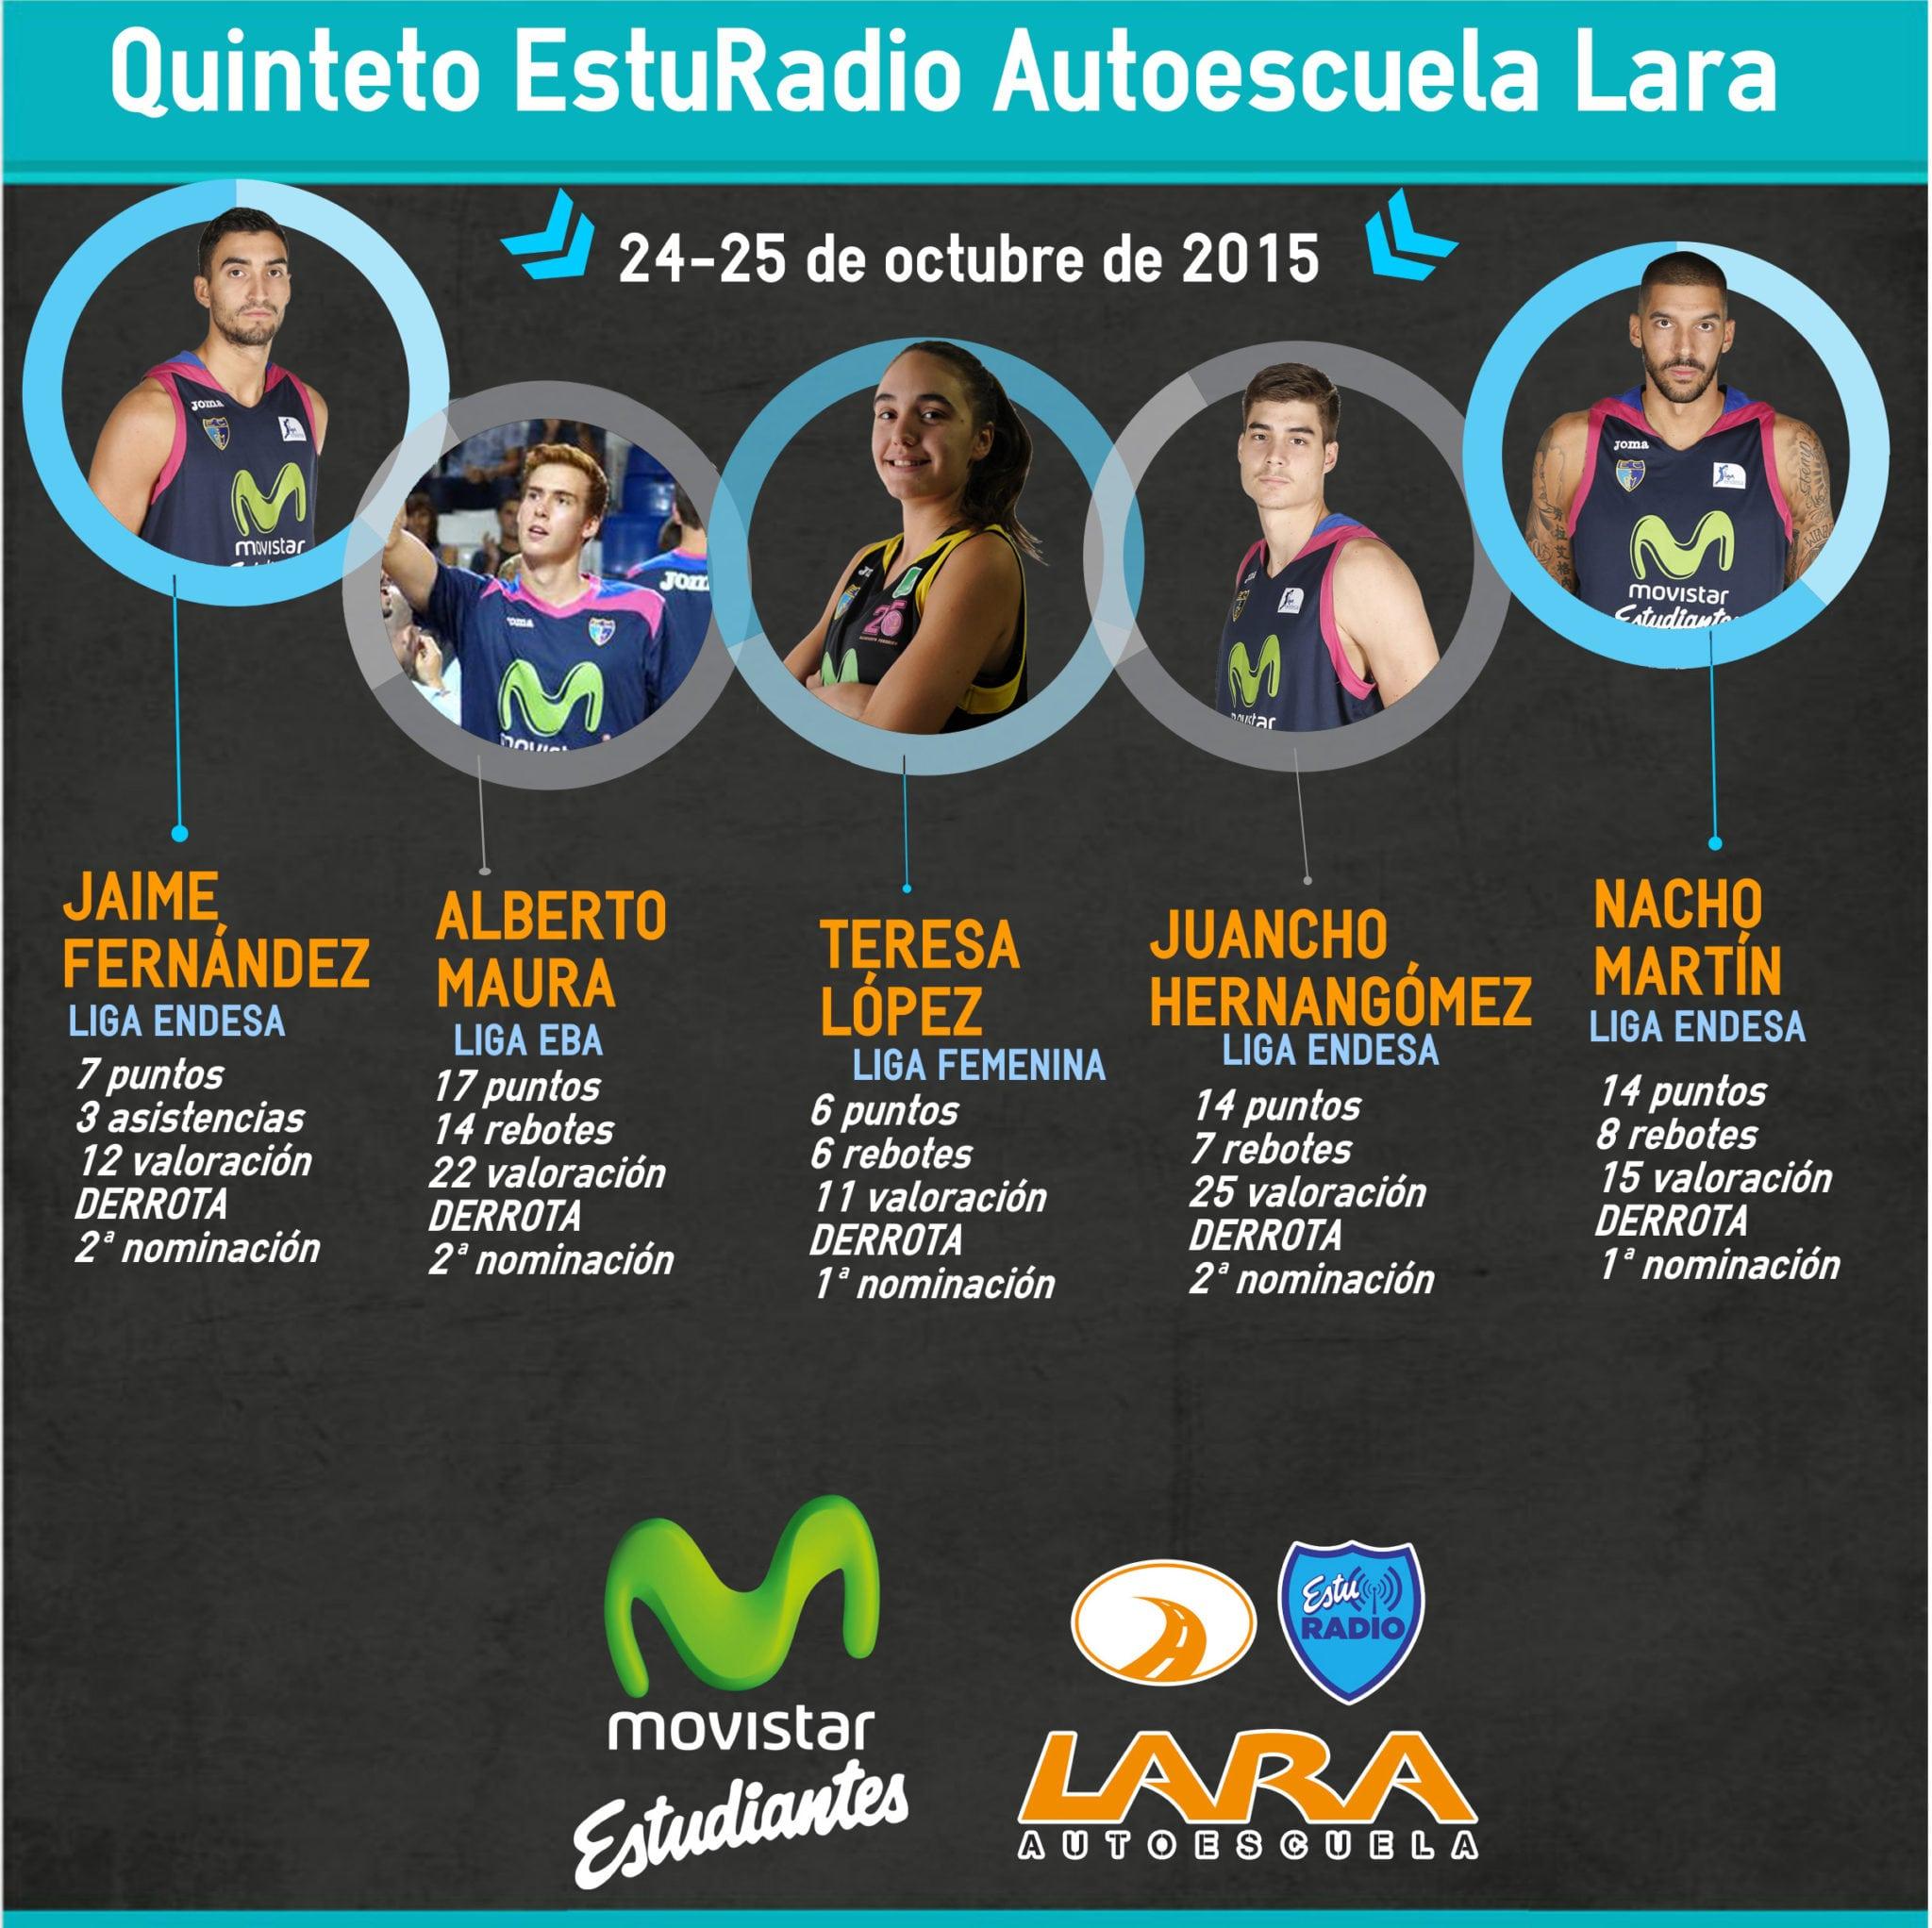 2º Quinteto EstuRadio: Jaime Fernández, Alberto Maura, Teresa López, Juancho Hernangómez y Nacho Martín